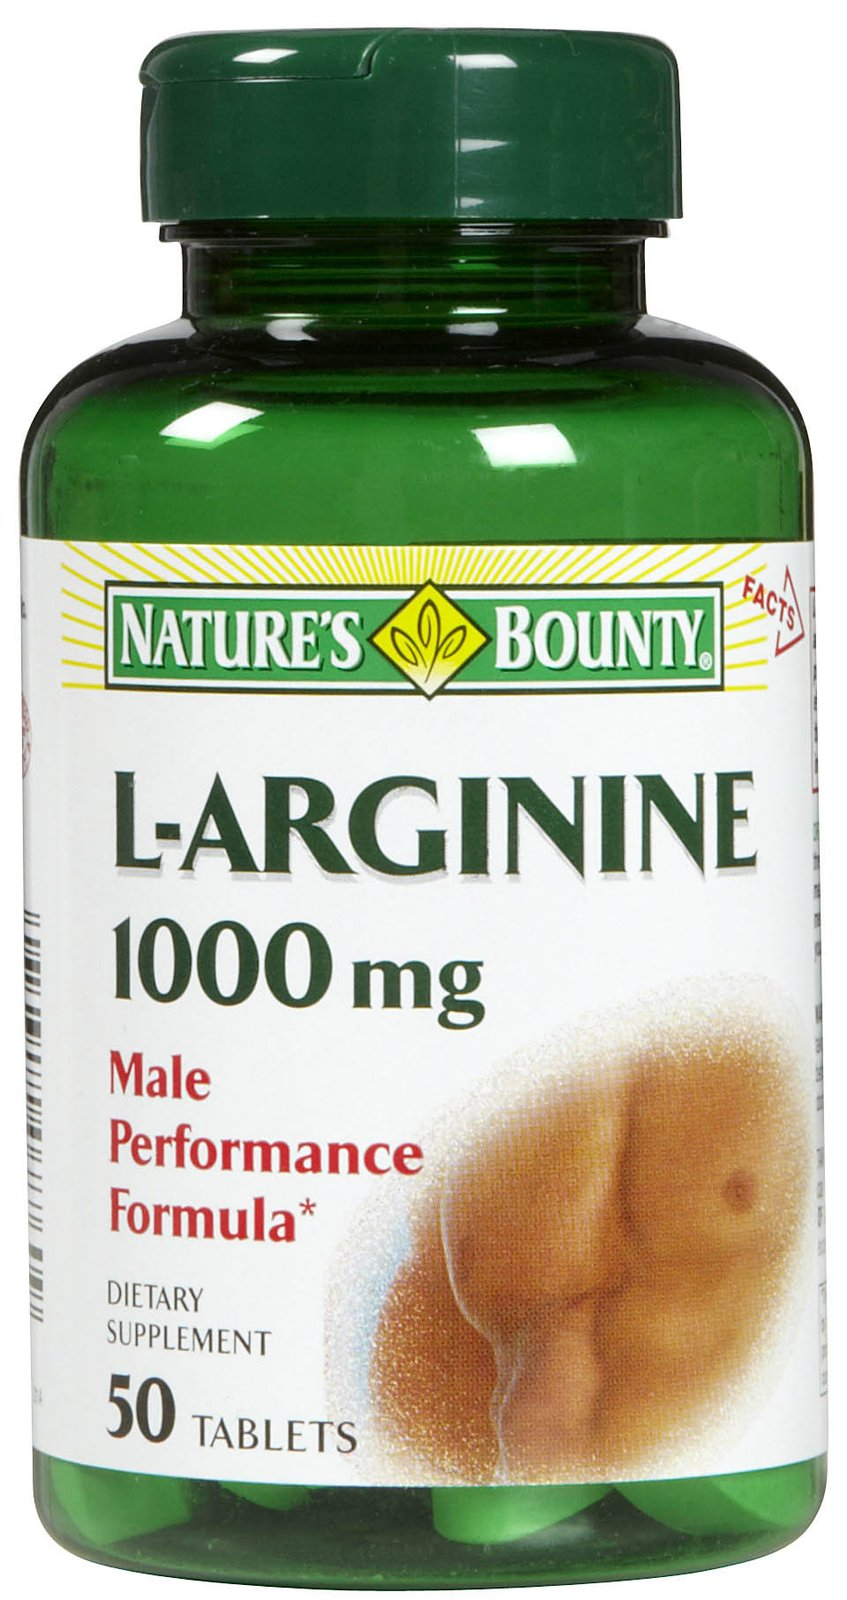 NATURE'S BOUNTY L-ARGNINE 50 TABS PRICE INDIA,L-Arginine 1000 mg, L-Arginine Nature's Bounty, Nature's Bounty L-Arginine, L-Arginine Price, Best L-Arginine, Nature's Bounty L-Arginine price, Nature's Bounty L-Arginine india, Nature's Bounty L-Arginine 1000 mg, L-Arginine 1000 mg price, Nature's Bounty products, L-Arginine 1000 mg Delhi, L-Arginine Price Mumbai, L-Arginine low price, Nature's Bounty L-Arginine Noida, Looking for L-Arginine, Purchase L-Arginine, Nature's Bounty L-Arginine 1000 mg Pune, Nature's Bounty L-Arginine Kerala, Nature's Bounty L-Arginine in Gurgaon, All Nature's Bounty Products, Nature's Bounty all products, Nature's Bounty L-Arginine at low price, Nature's Bounty L-Arginine best price, Searching for Nature's Bounty L-Arginine, Nature's Bounty health care, L-Arginine buy online, L-Arginine available online, L-Arginine in Punjab, L-Arginine in Chennai, L-Arginine 1000 mg at best price, Genuine L-Arginine 1000 mg supplement, L-Arginine 1000 mg by Natures Bounty